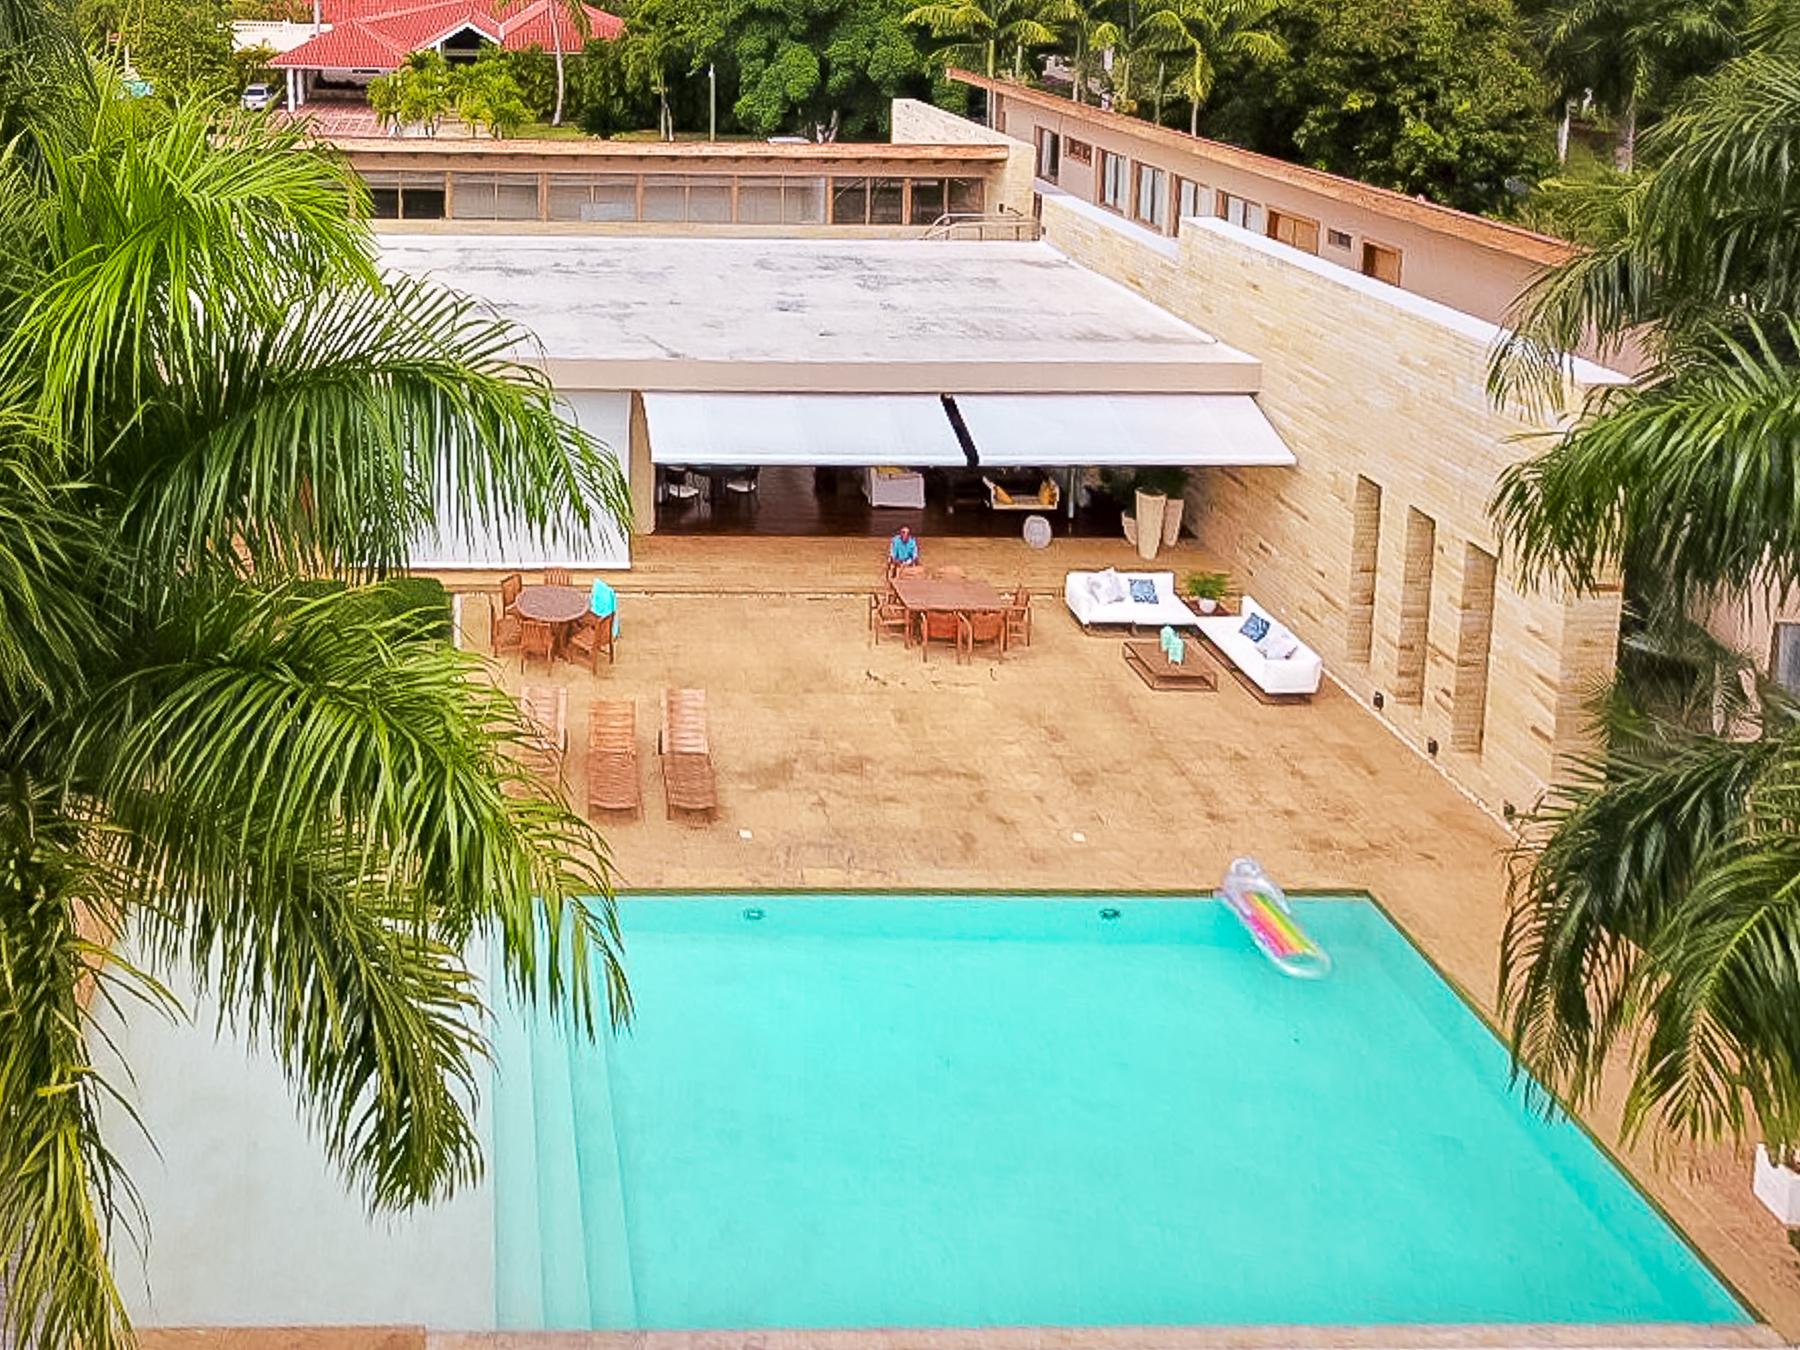 Flawless Contemporary Design Golf front home at Casa de Campo